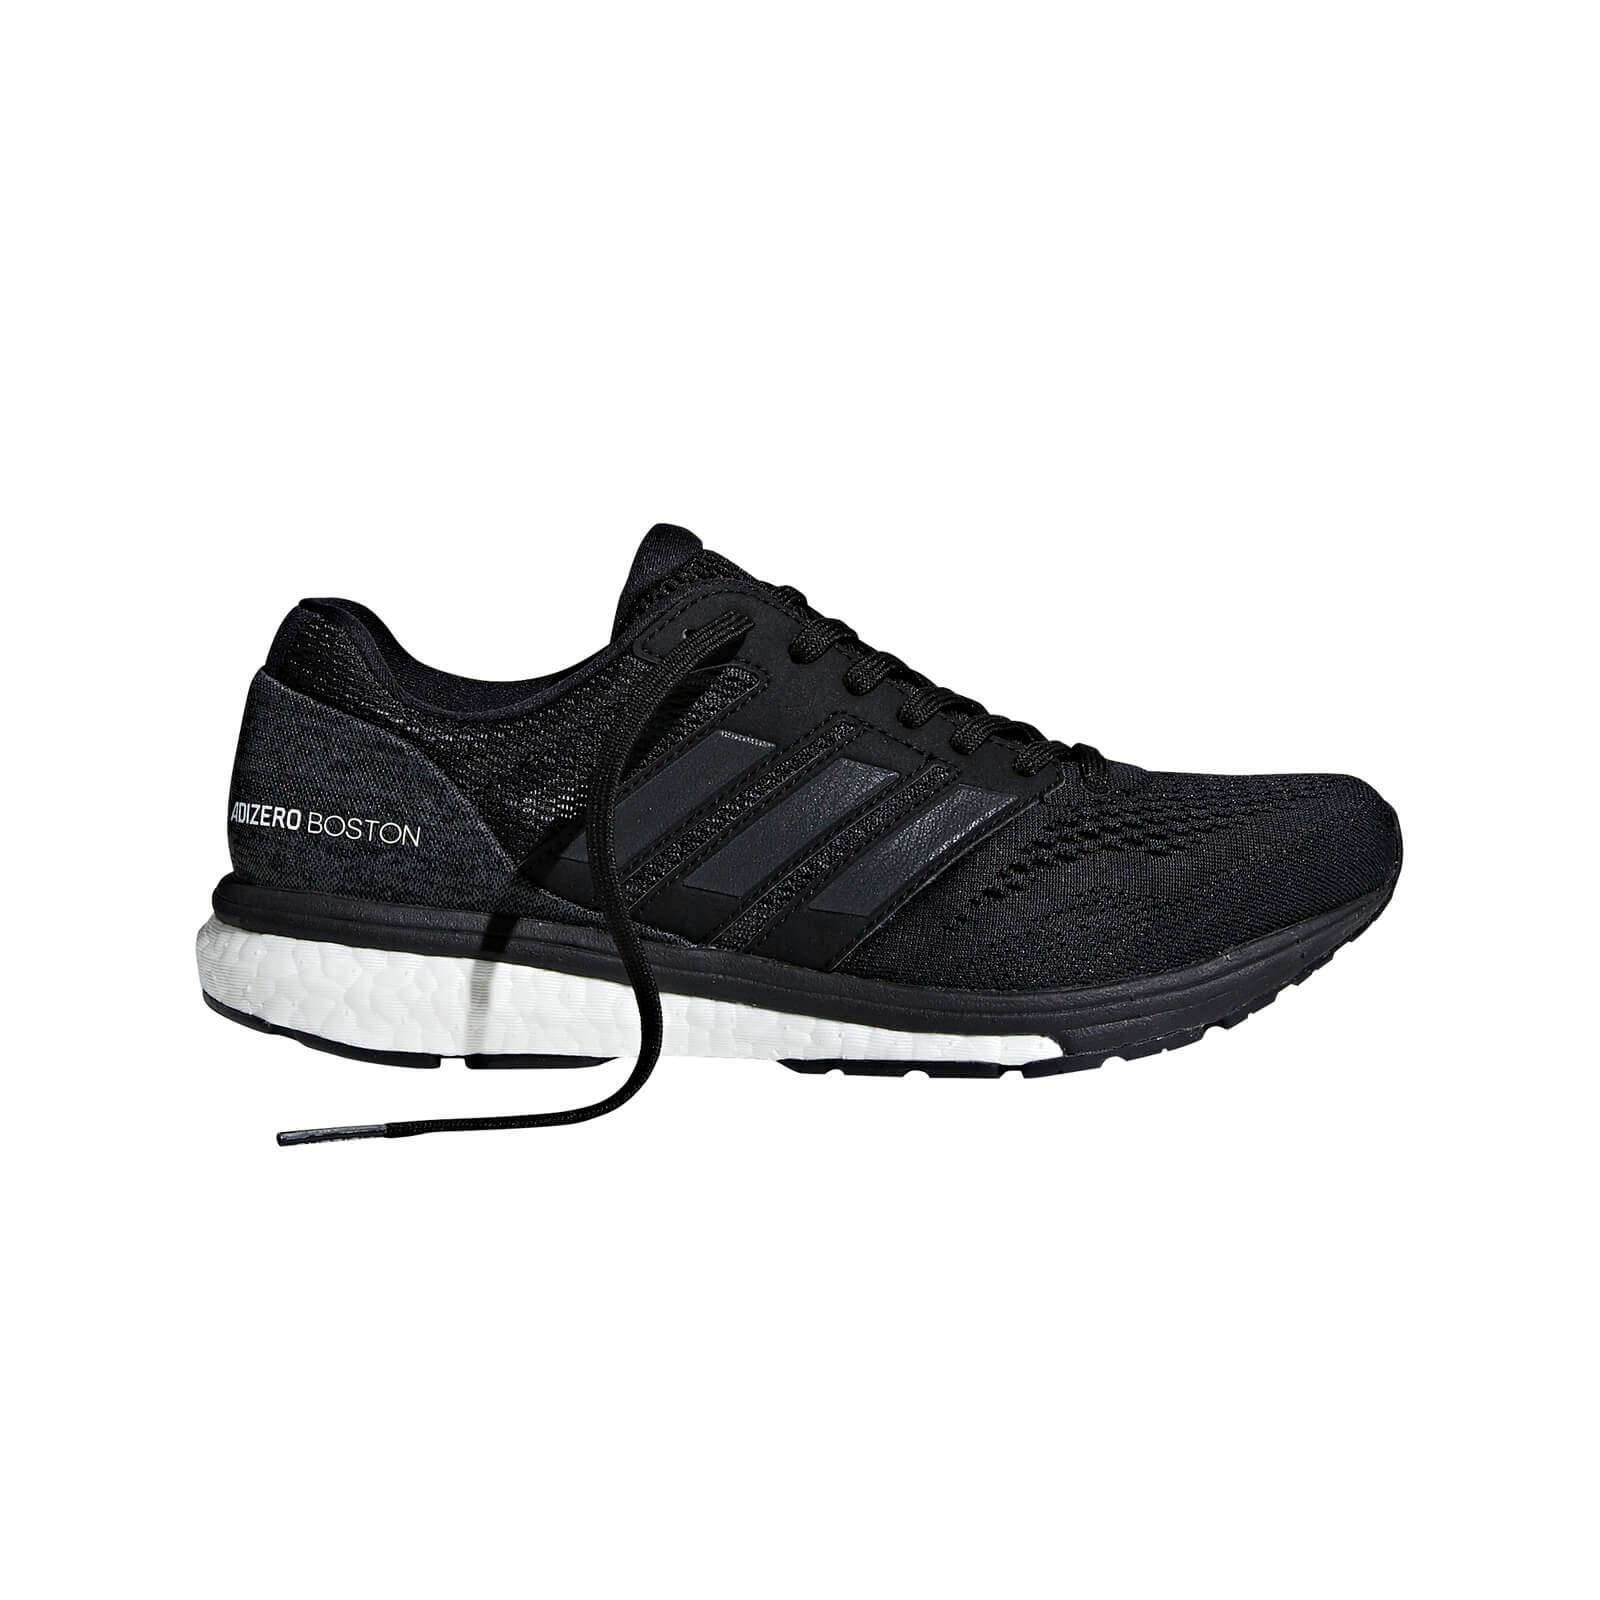 988867a8b adidas Women s Adizero Adios Boston 7 Running Shoes - Black ...